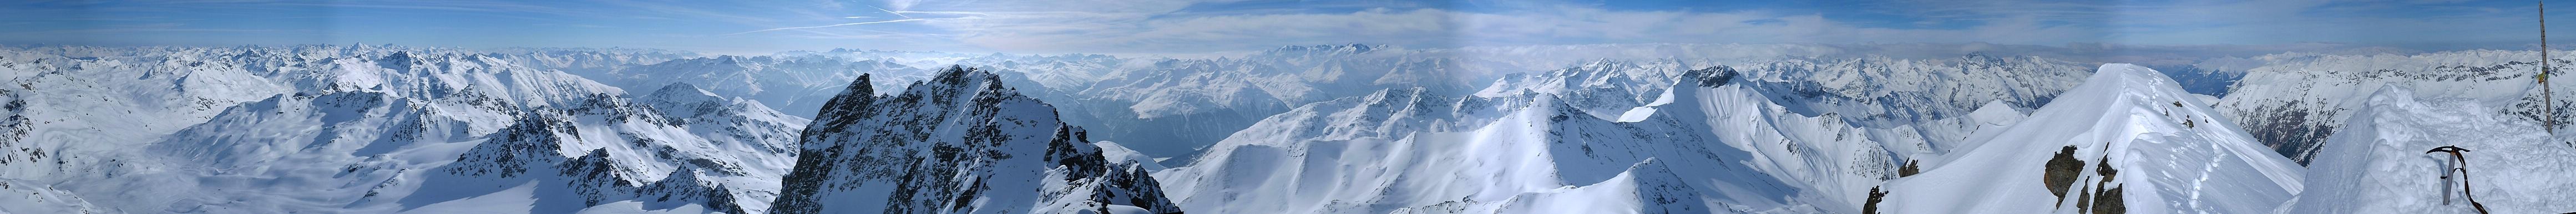 Piz Kesch - Chamanna Kesch Albula Alpen Švýcarsko panorama 40